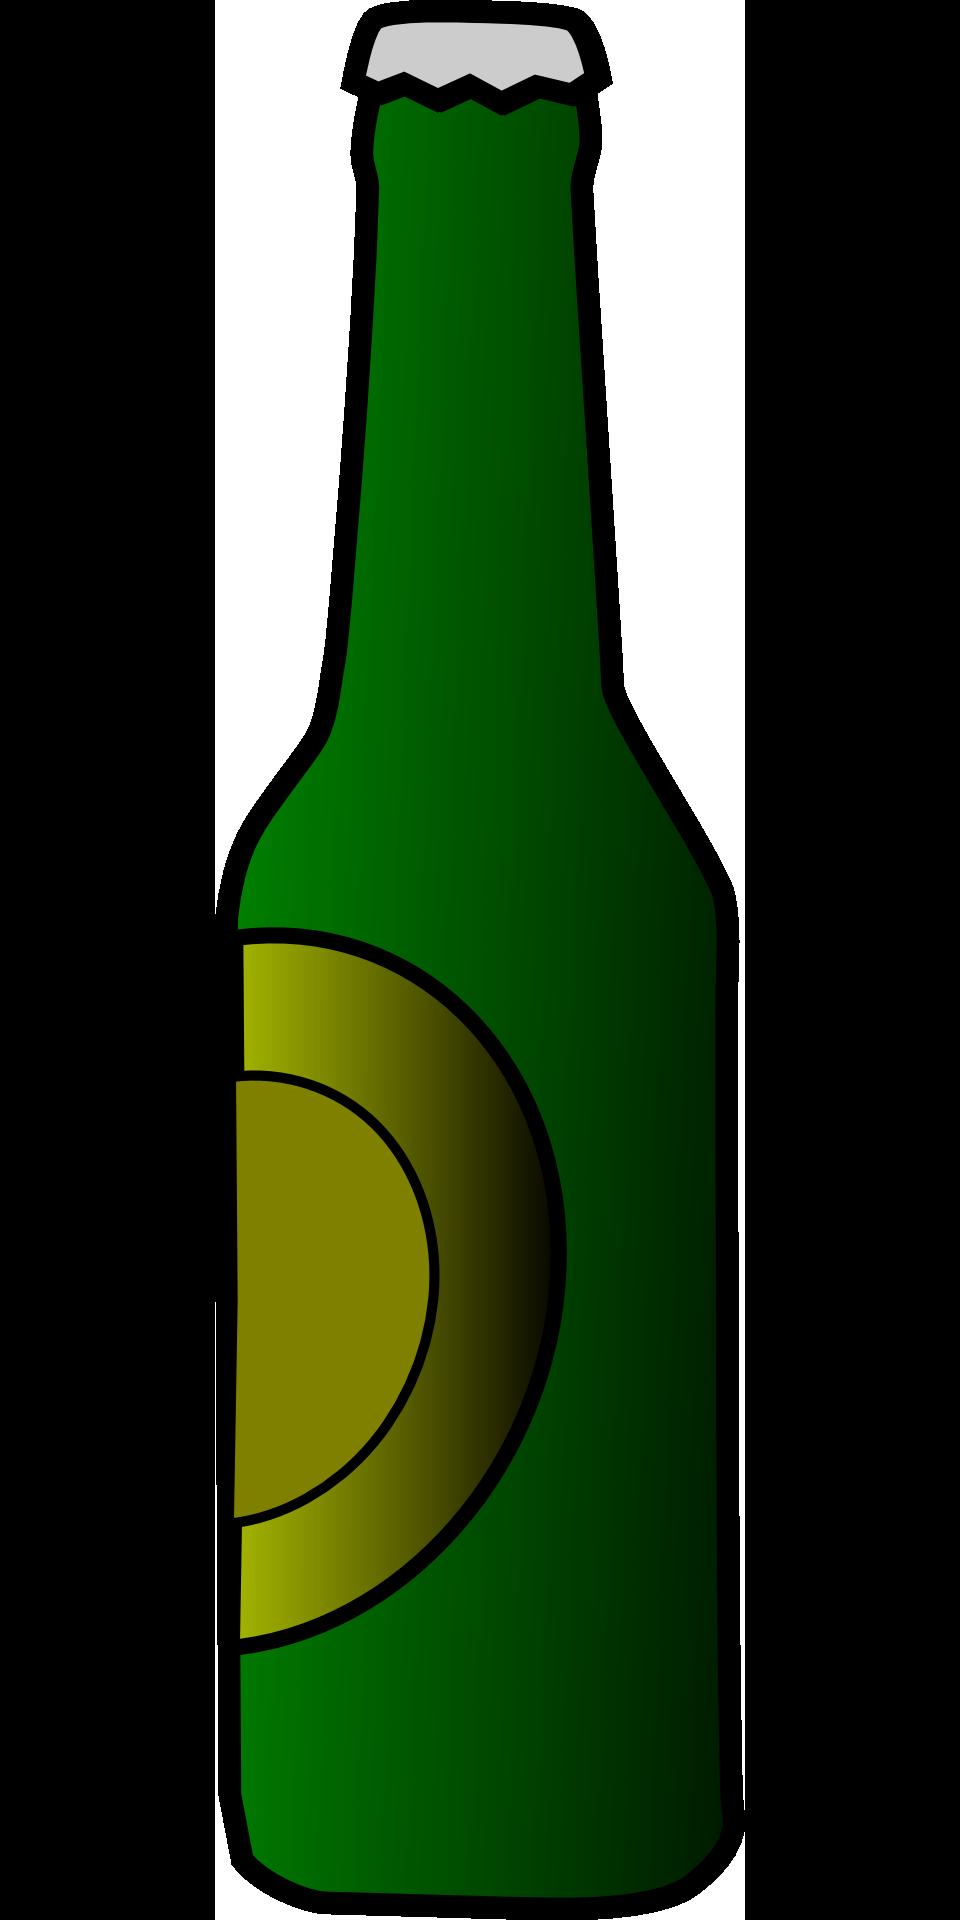 svg library stock Beer clipart beer wine. Bottle clip art jiangnan.